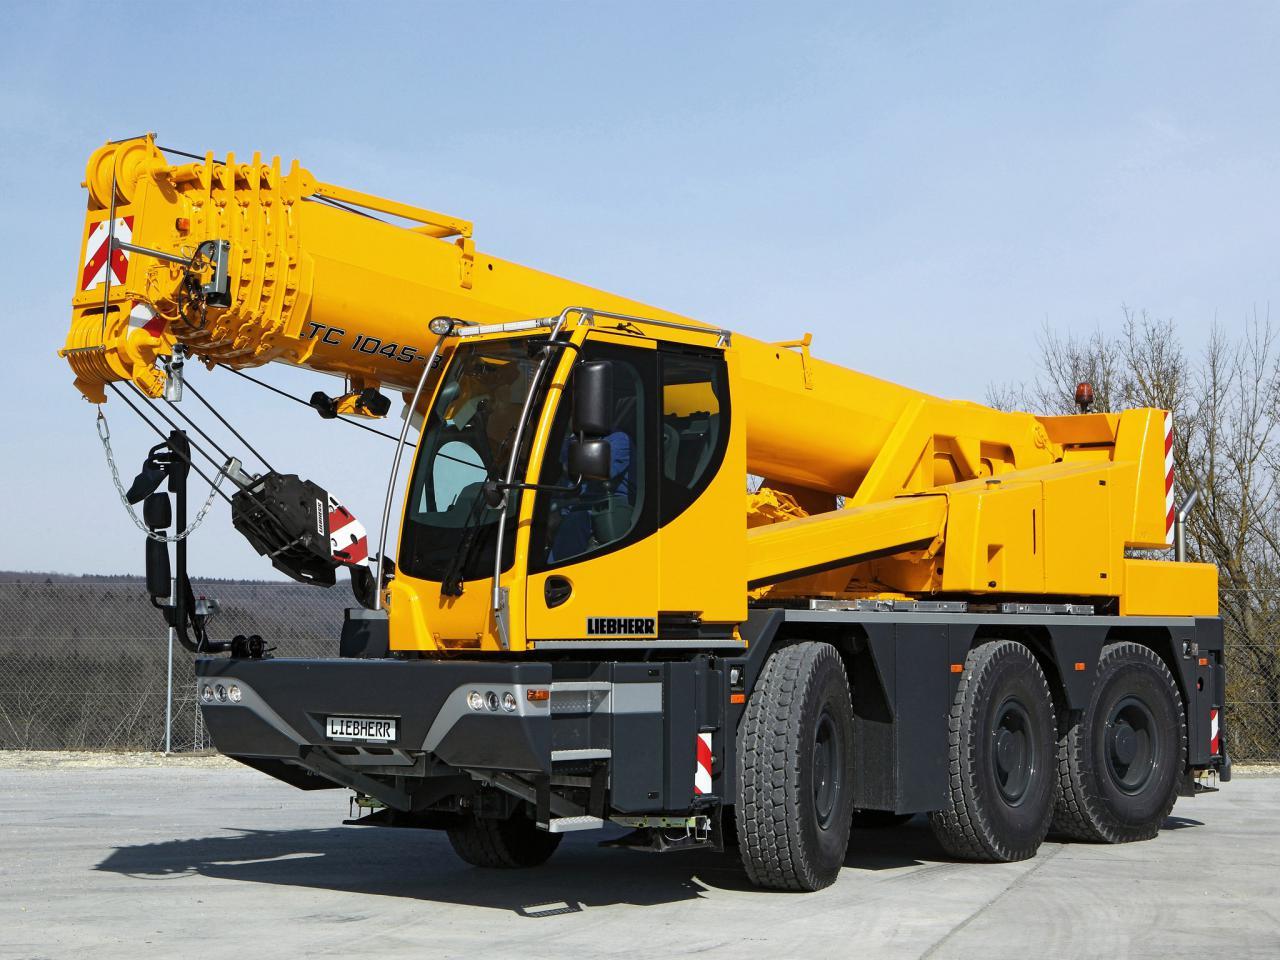 Mobile Crane Machine : Liebherr ltc